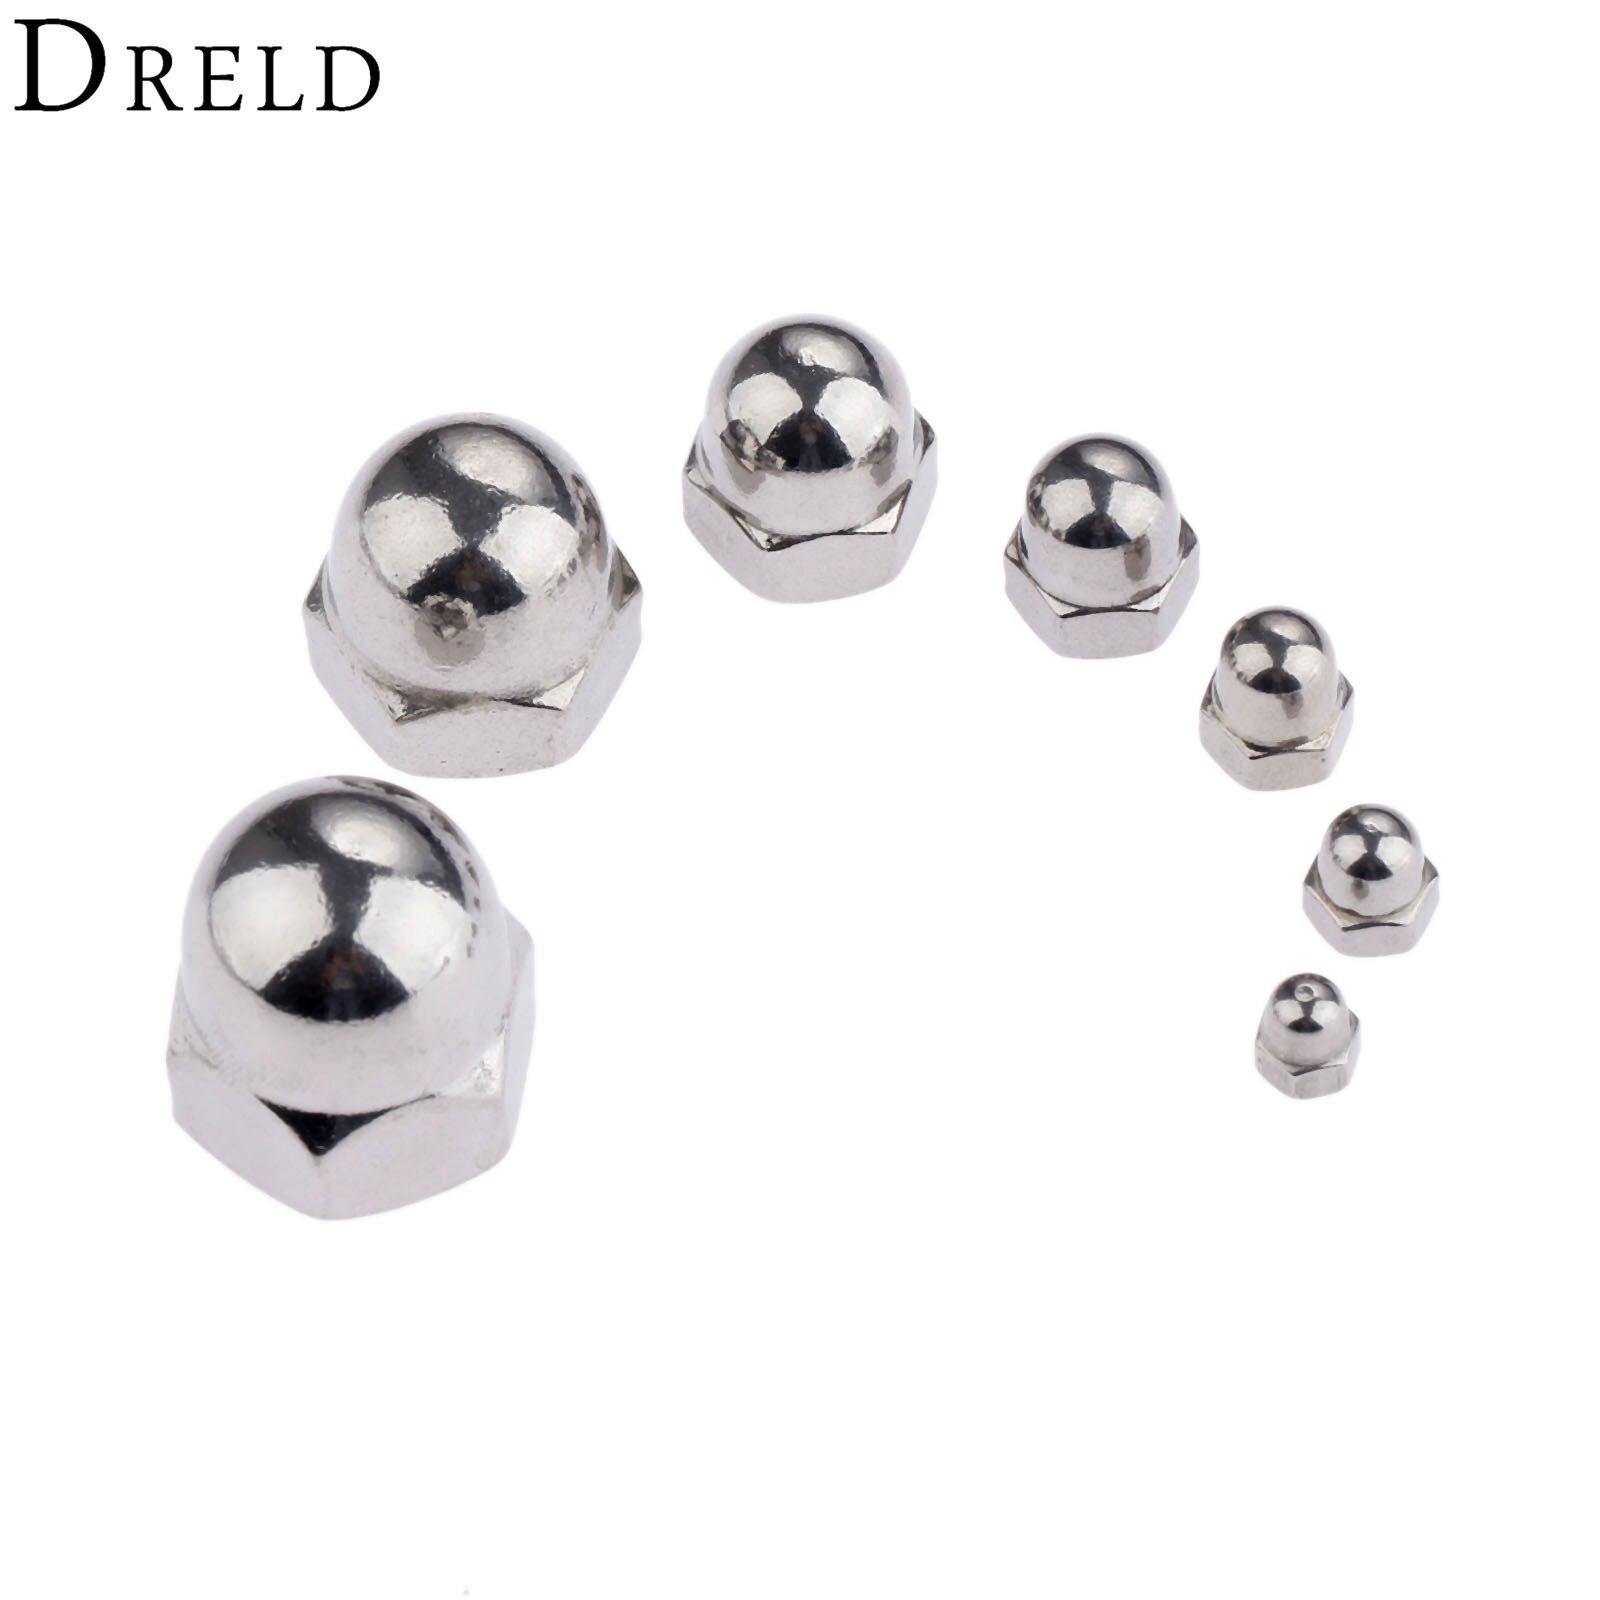 DRELD 10Pcs M3/M4/M5/M6/M8 Stainless Steel Cap Nuts Round Head Cover Decorative Nut Metric M3-M8 Hex